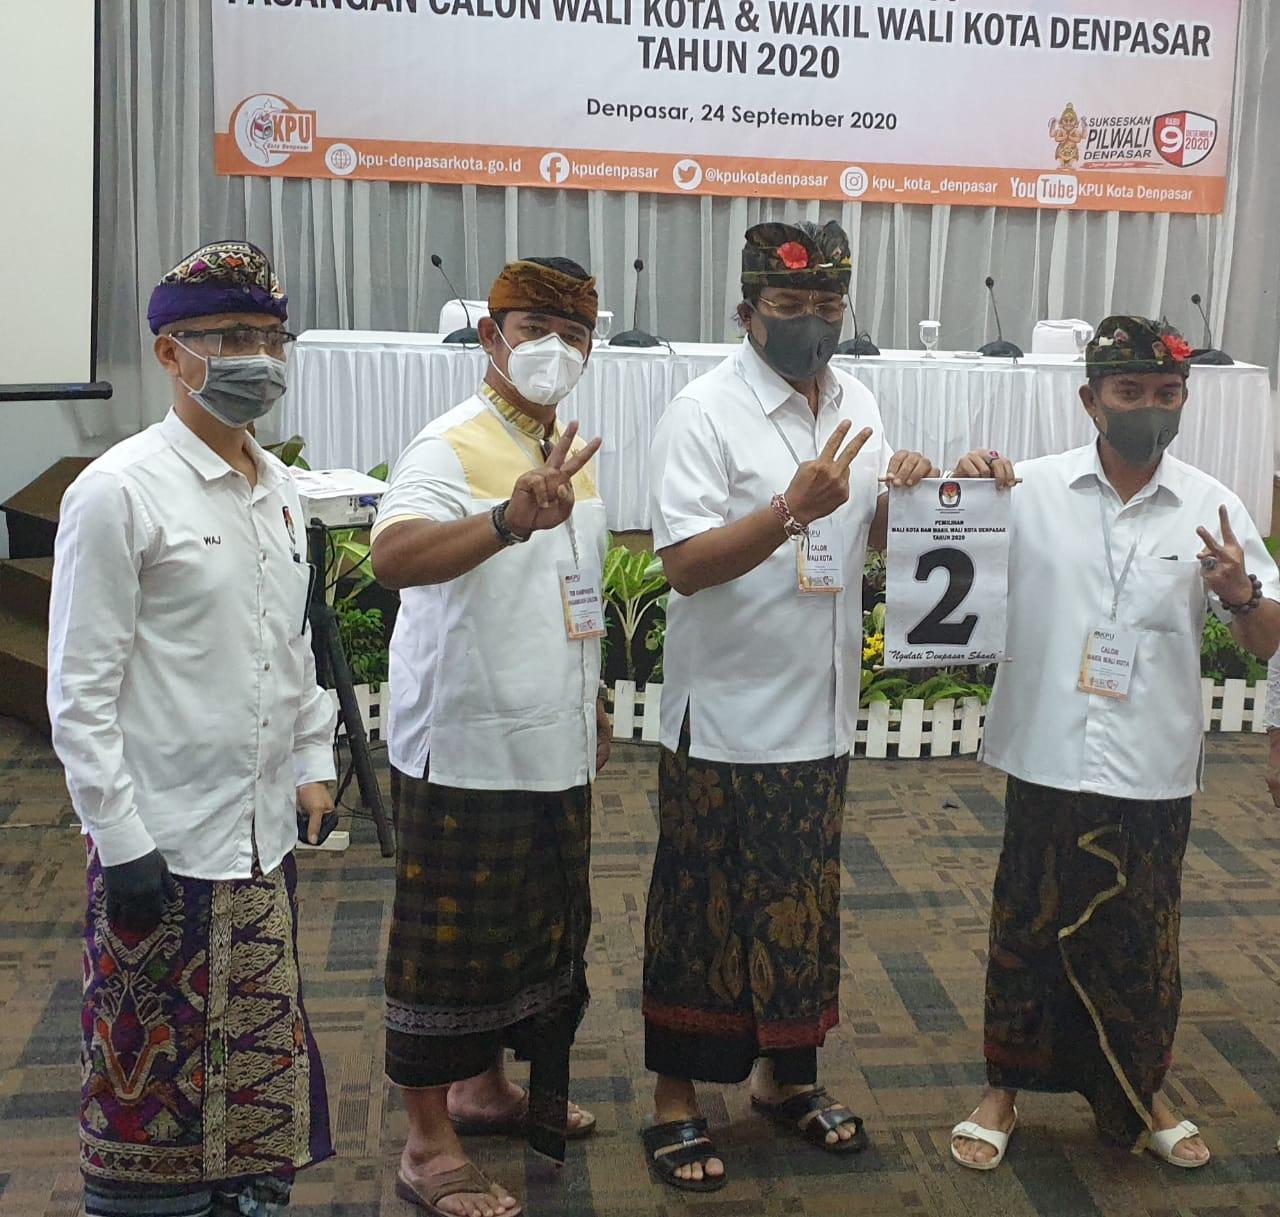 MARIYANA Wandhira (dua kiri) saat tahapan pengundian nomor urut Pilkada Denpasar 2020. Dia menanti komitmen IGN Jaya Negara bukan hanya sebatas petugas partai, tapi Wali Kota Denpasar untuk seluruh warganya. Foto: hen